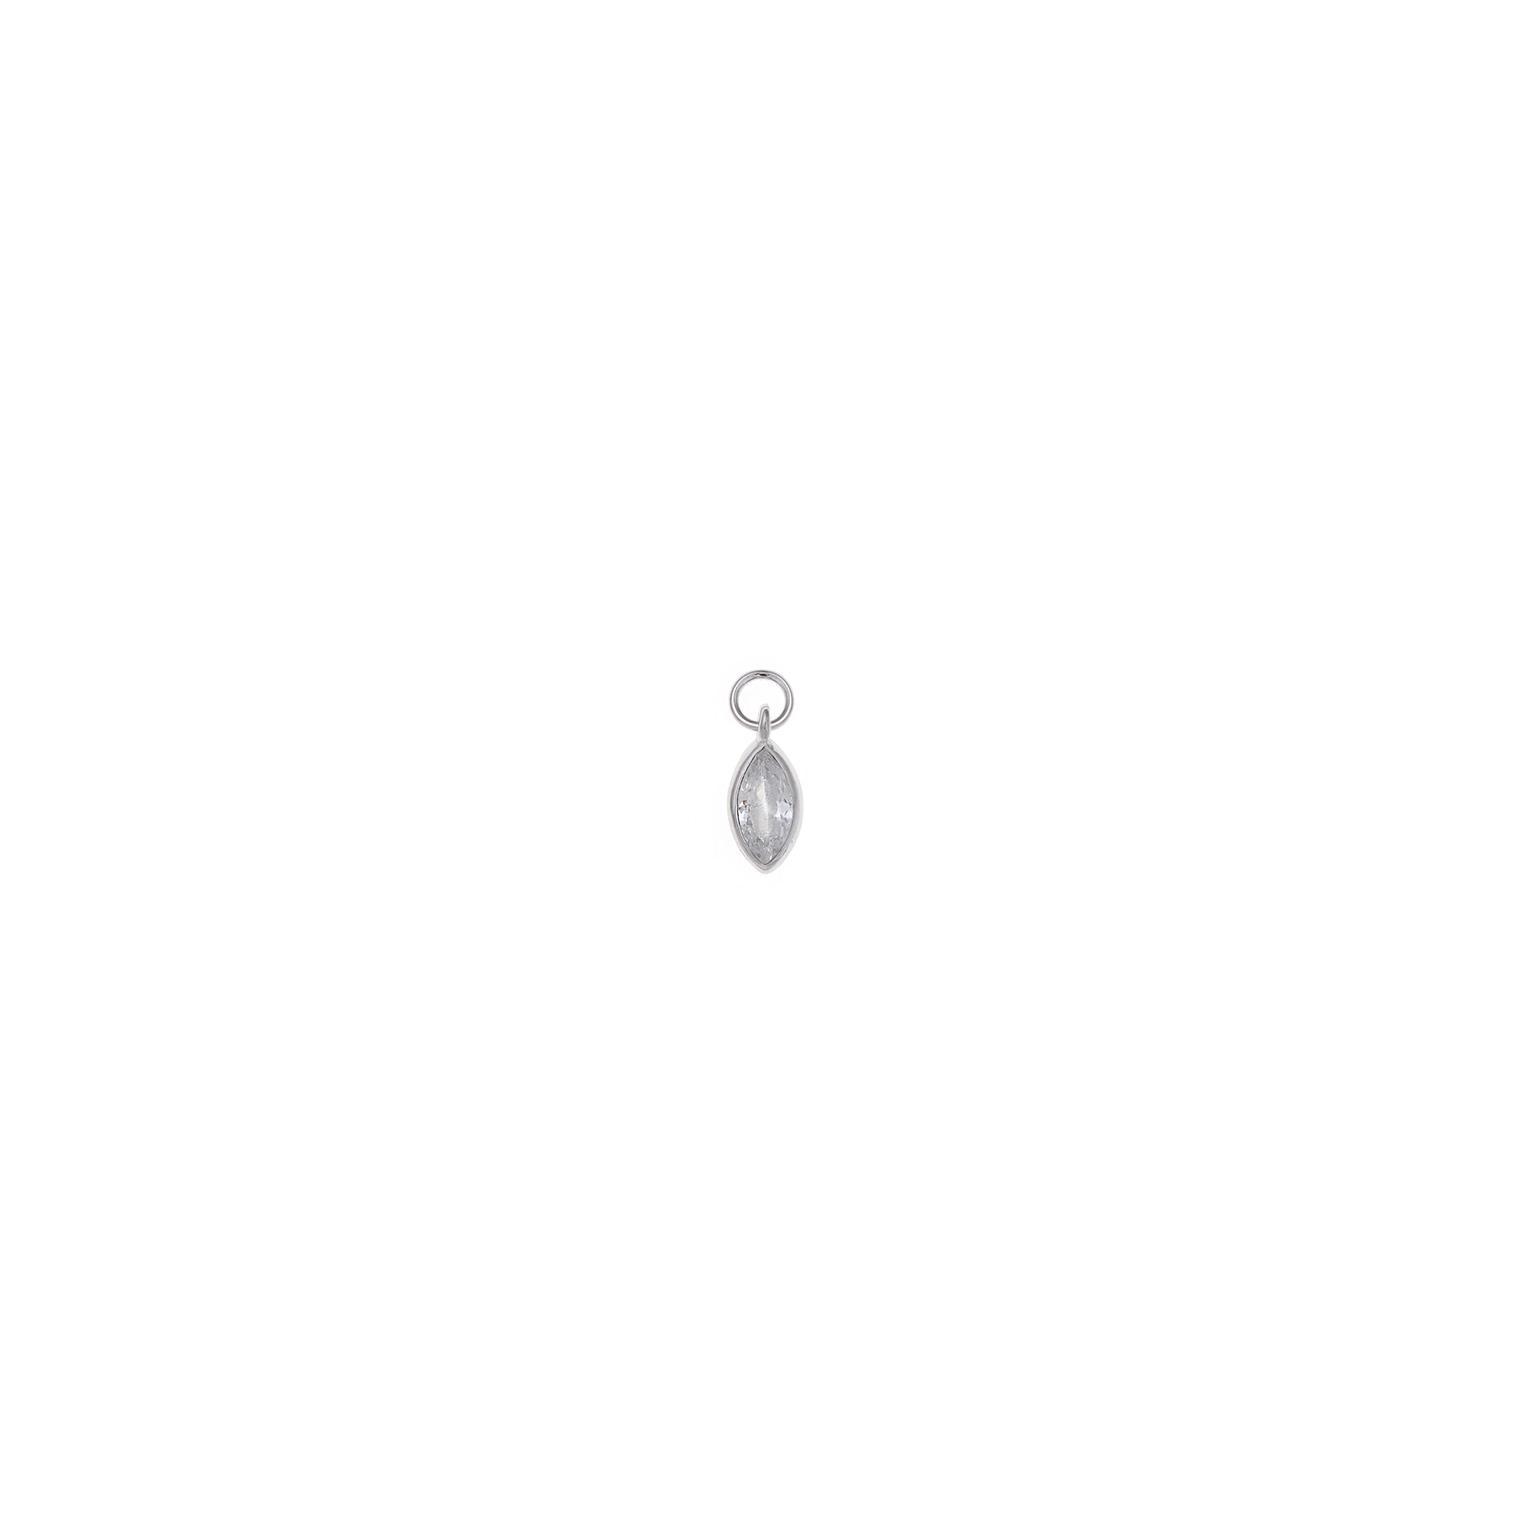 Charm plata Salvatore marquesa circonita blanca